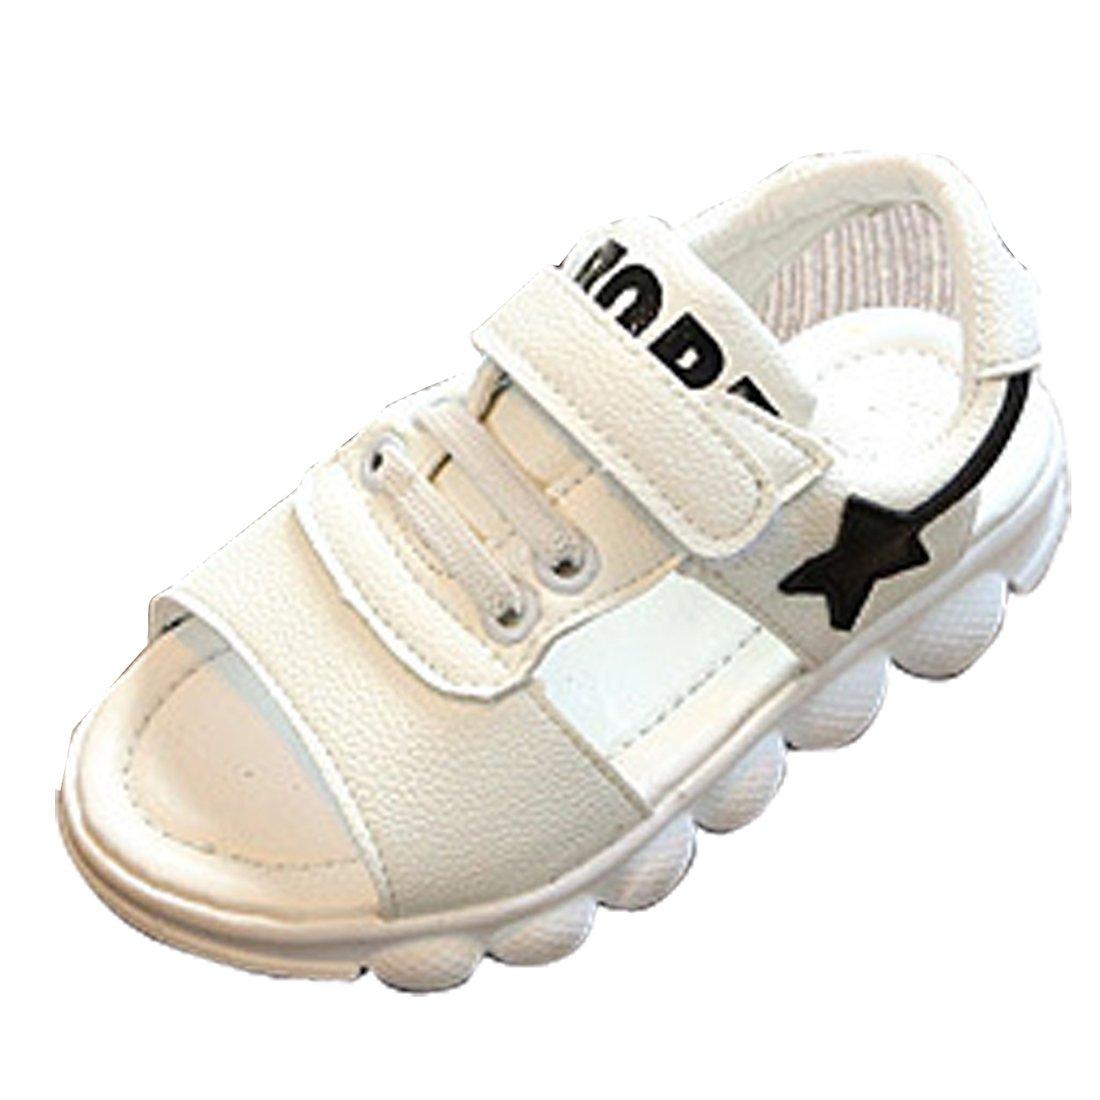 Gaorui Cute Kids Boys Girls Sport Beach Sandals Soft Leather Antiskid Flat Casual Shoes